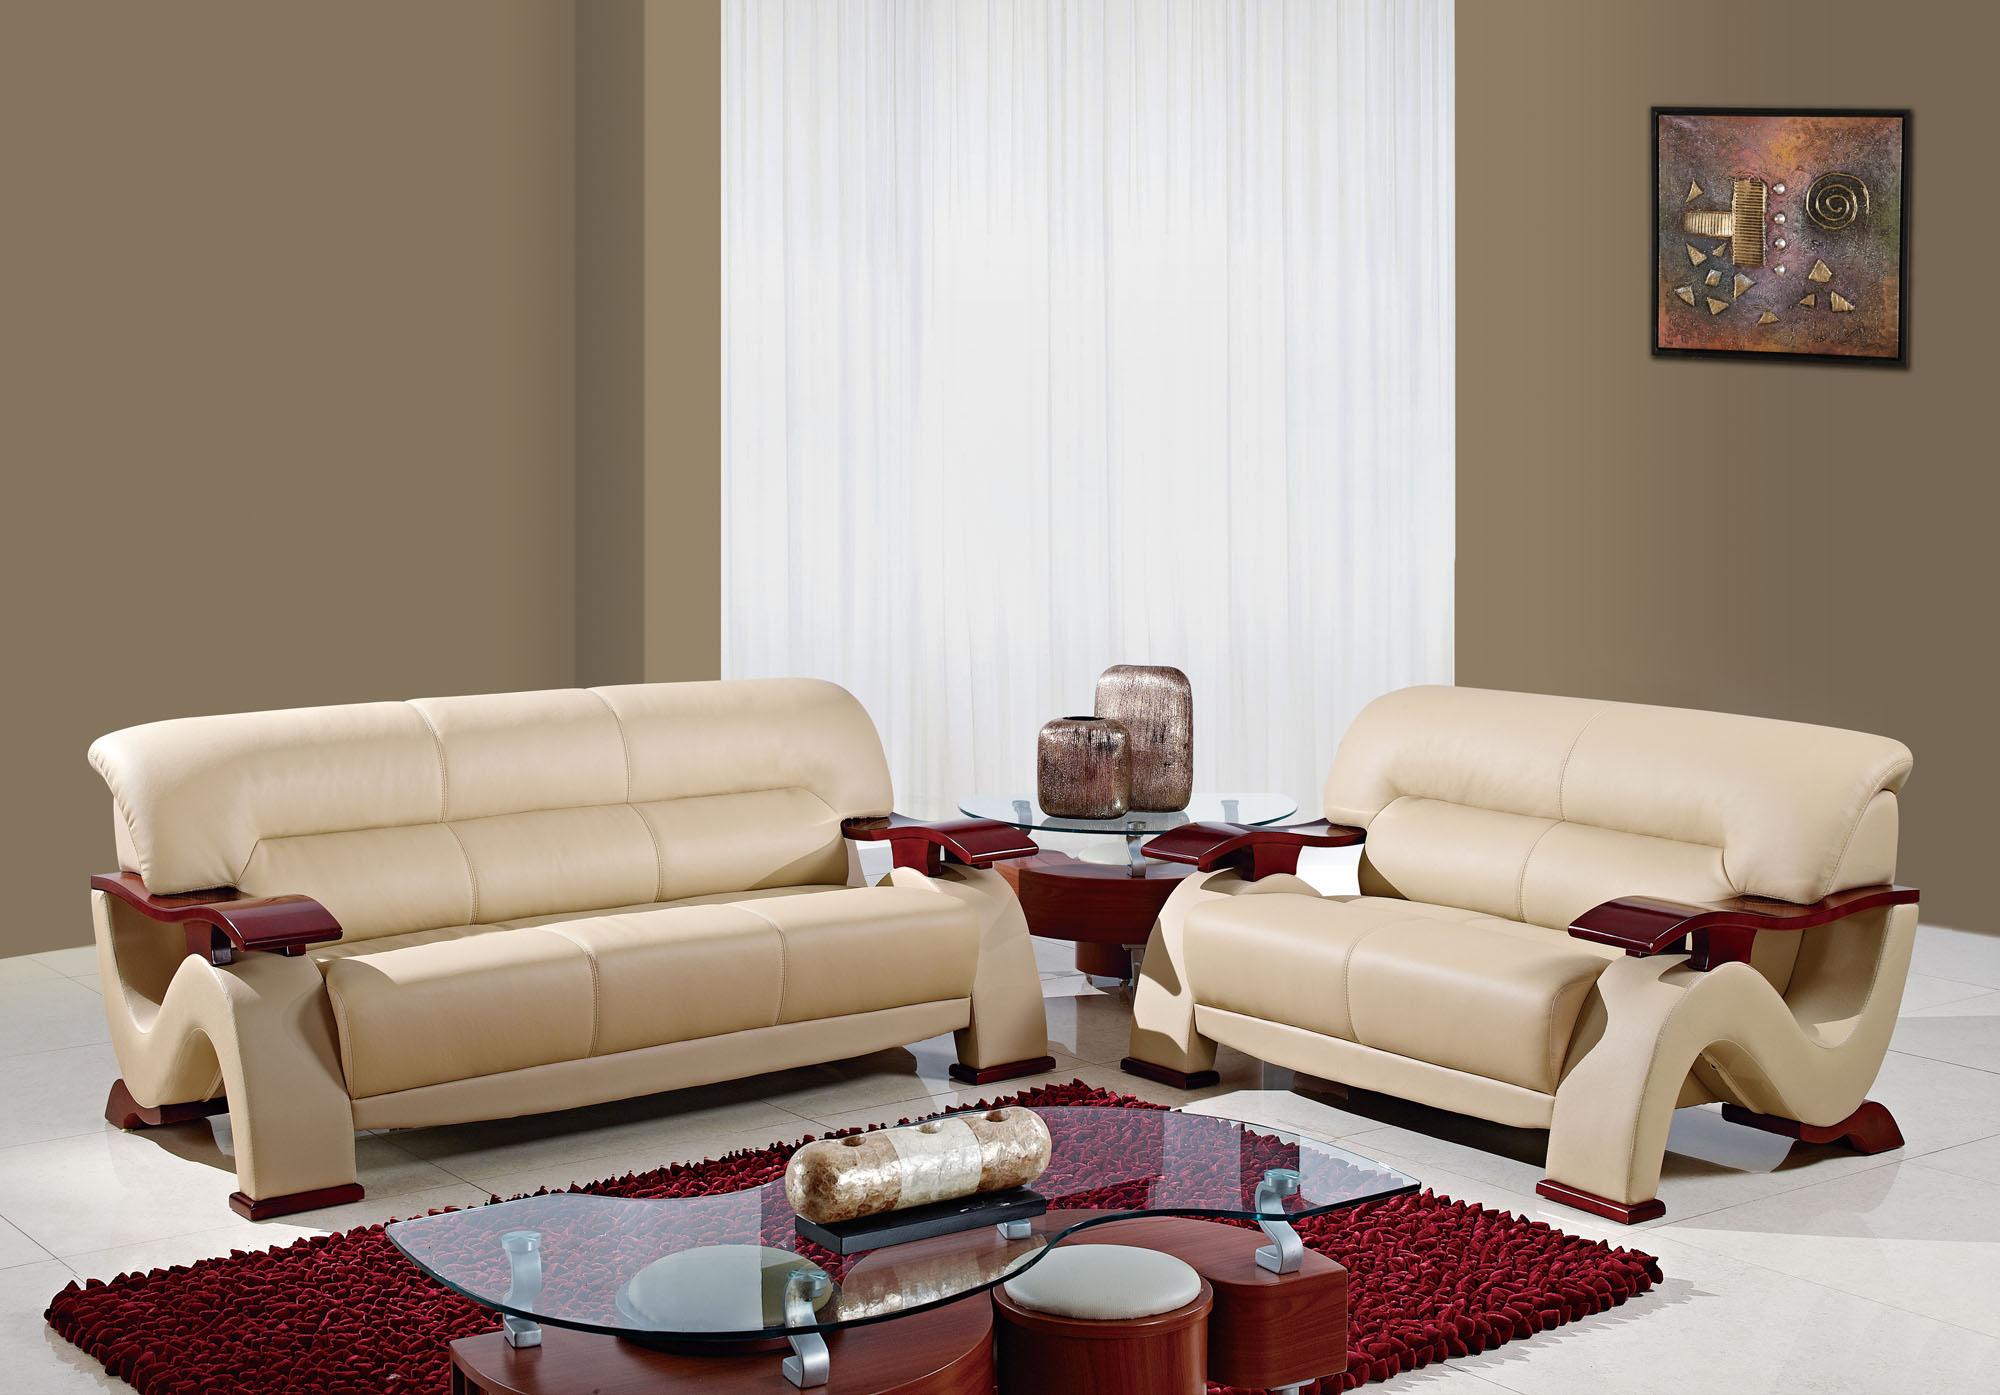 Lovely La Monarca Furniture